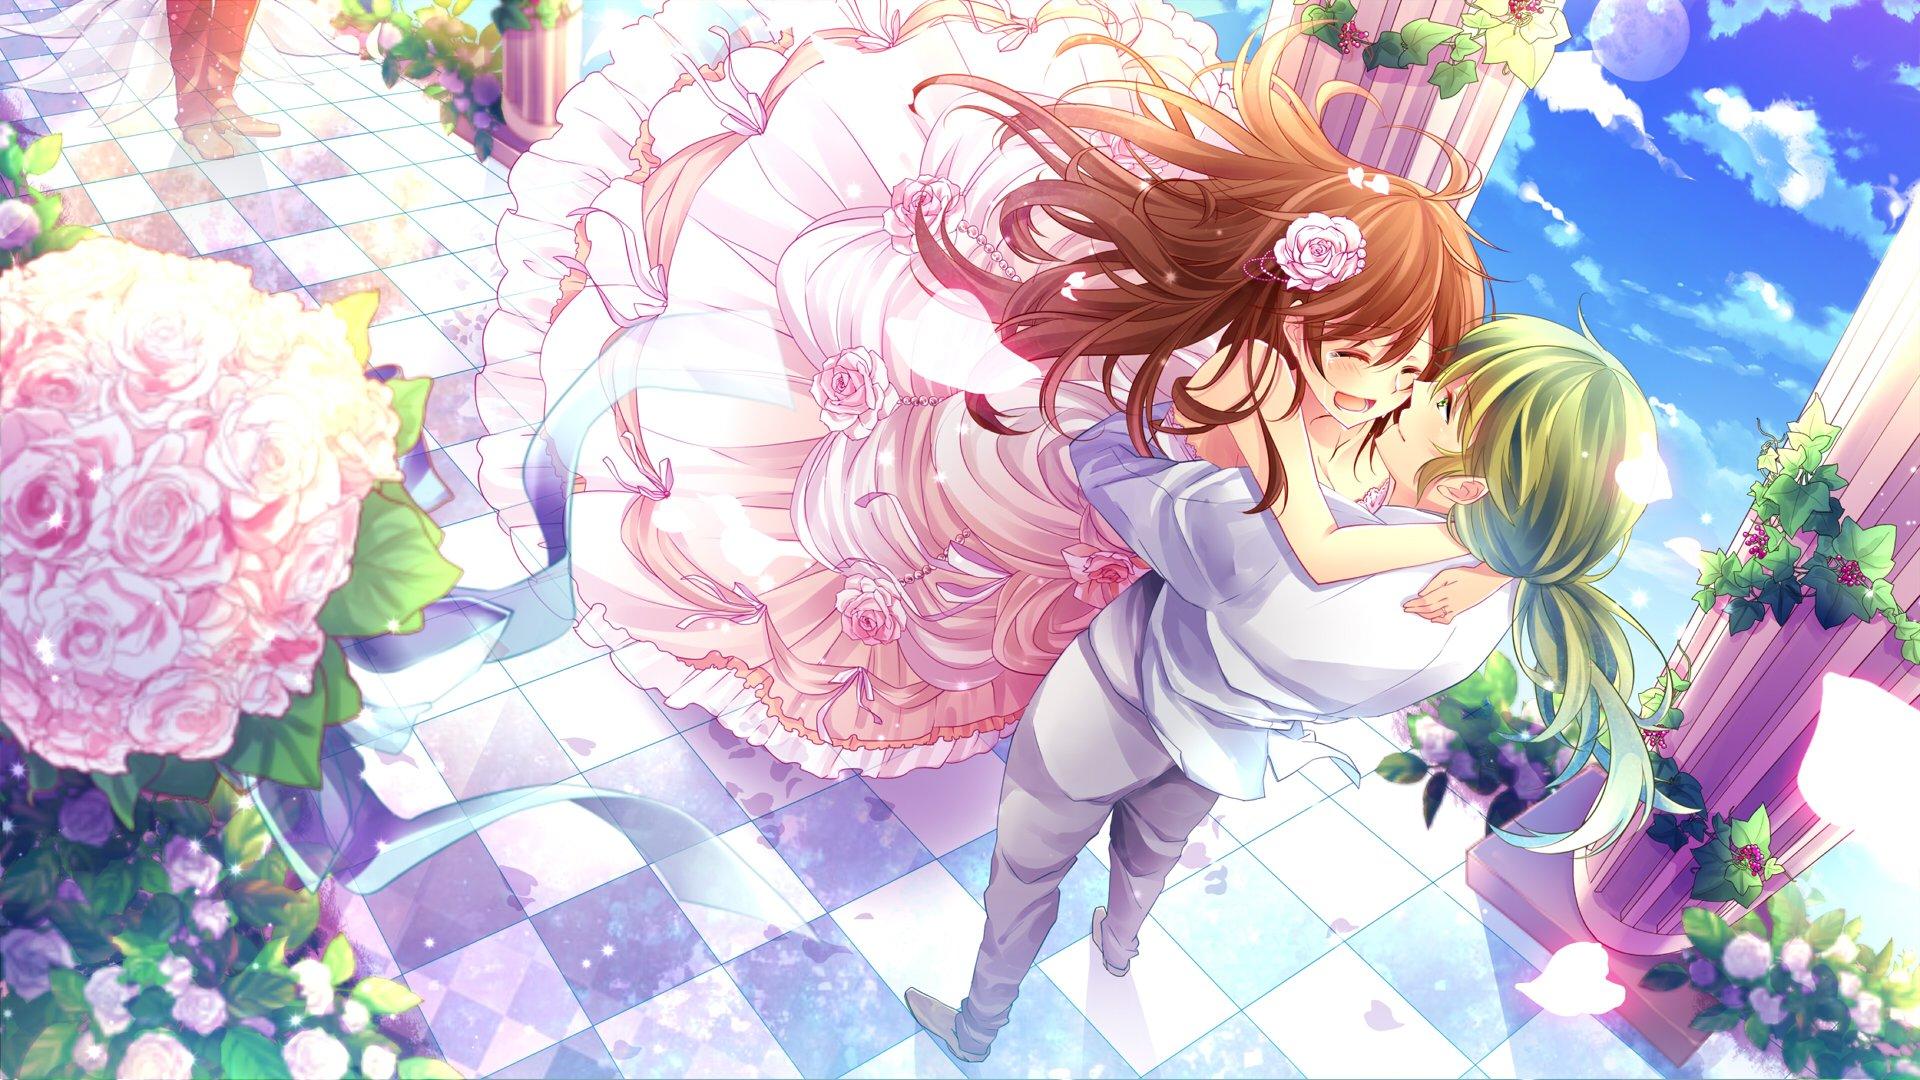 Anime Couple Bride Girl Male Rose Flower Pink Dress Sky